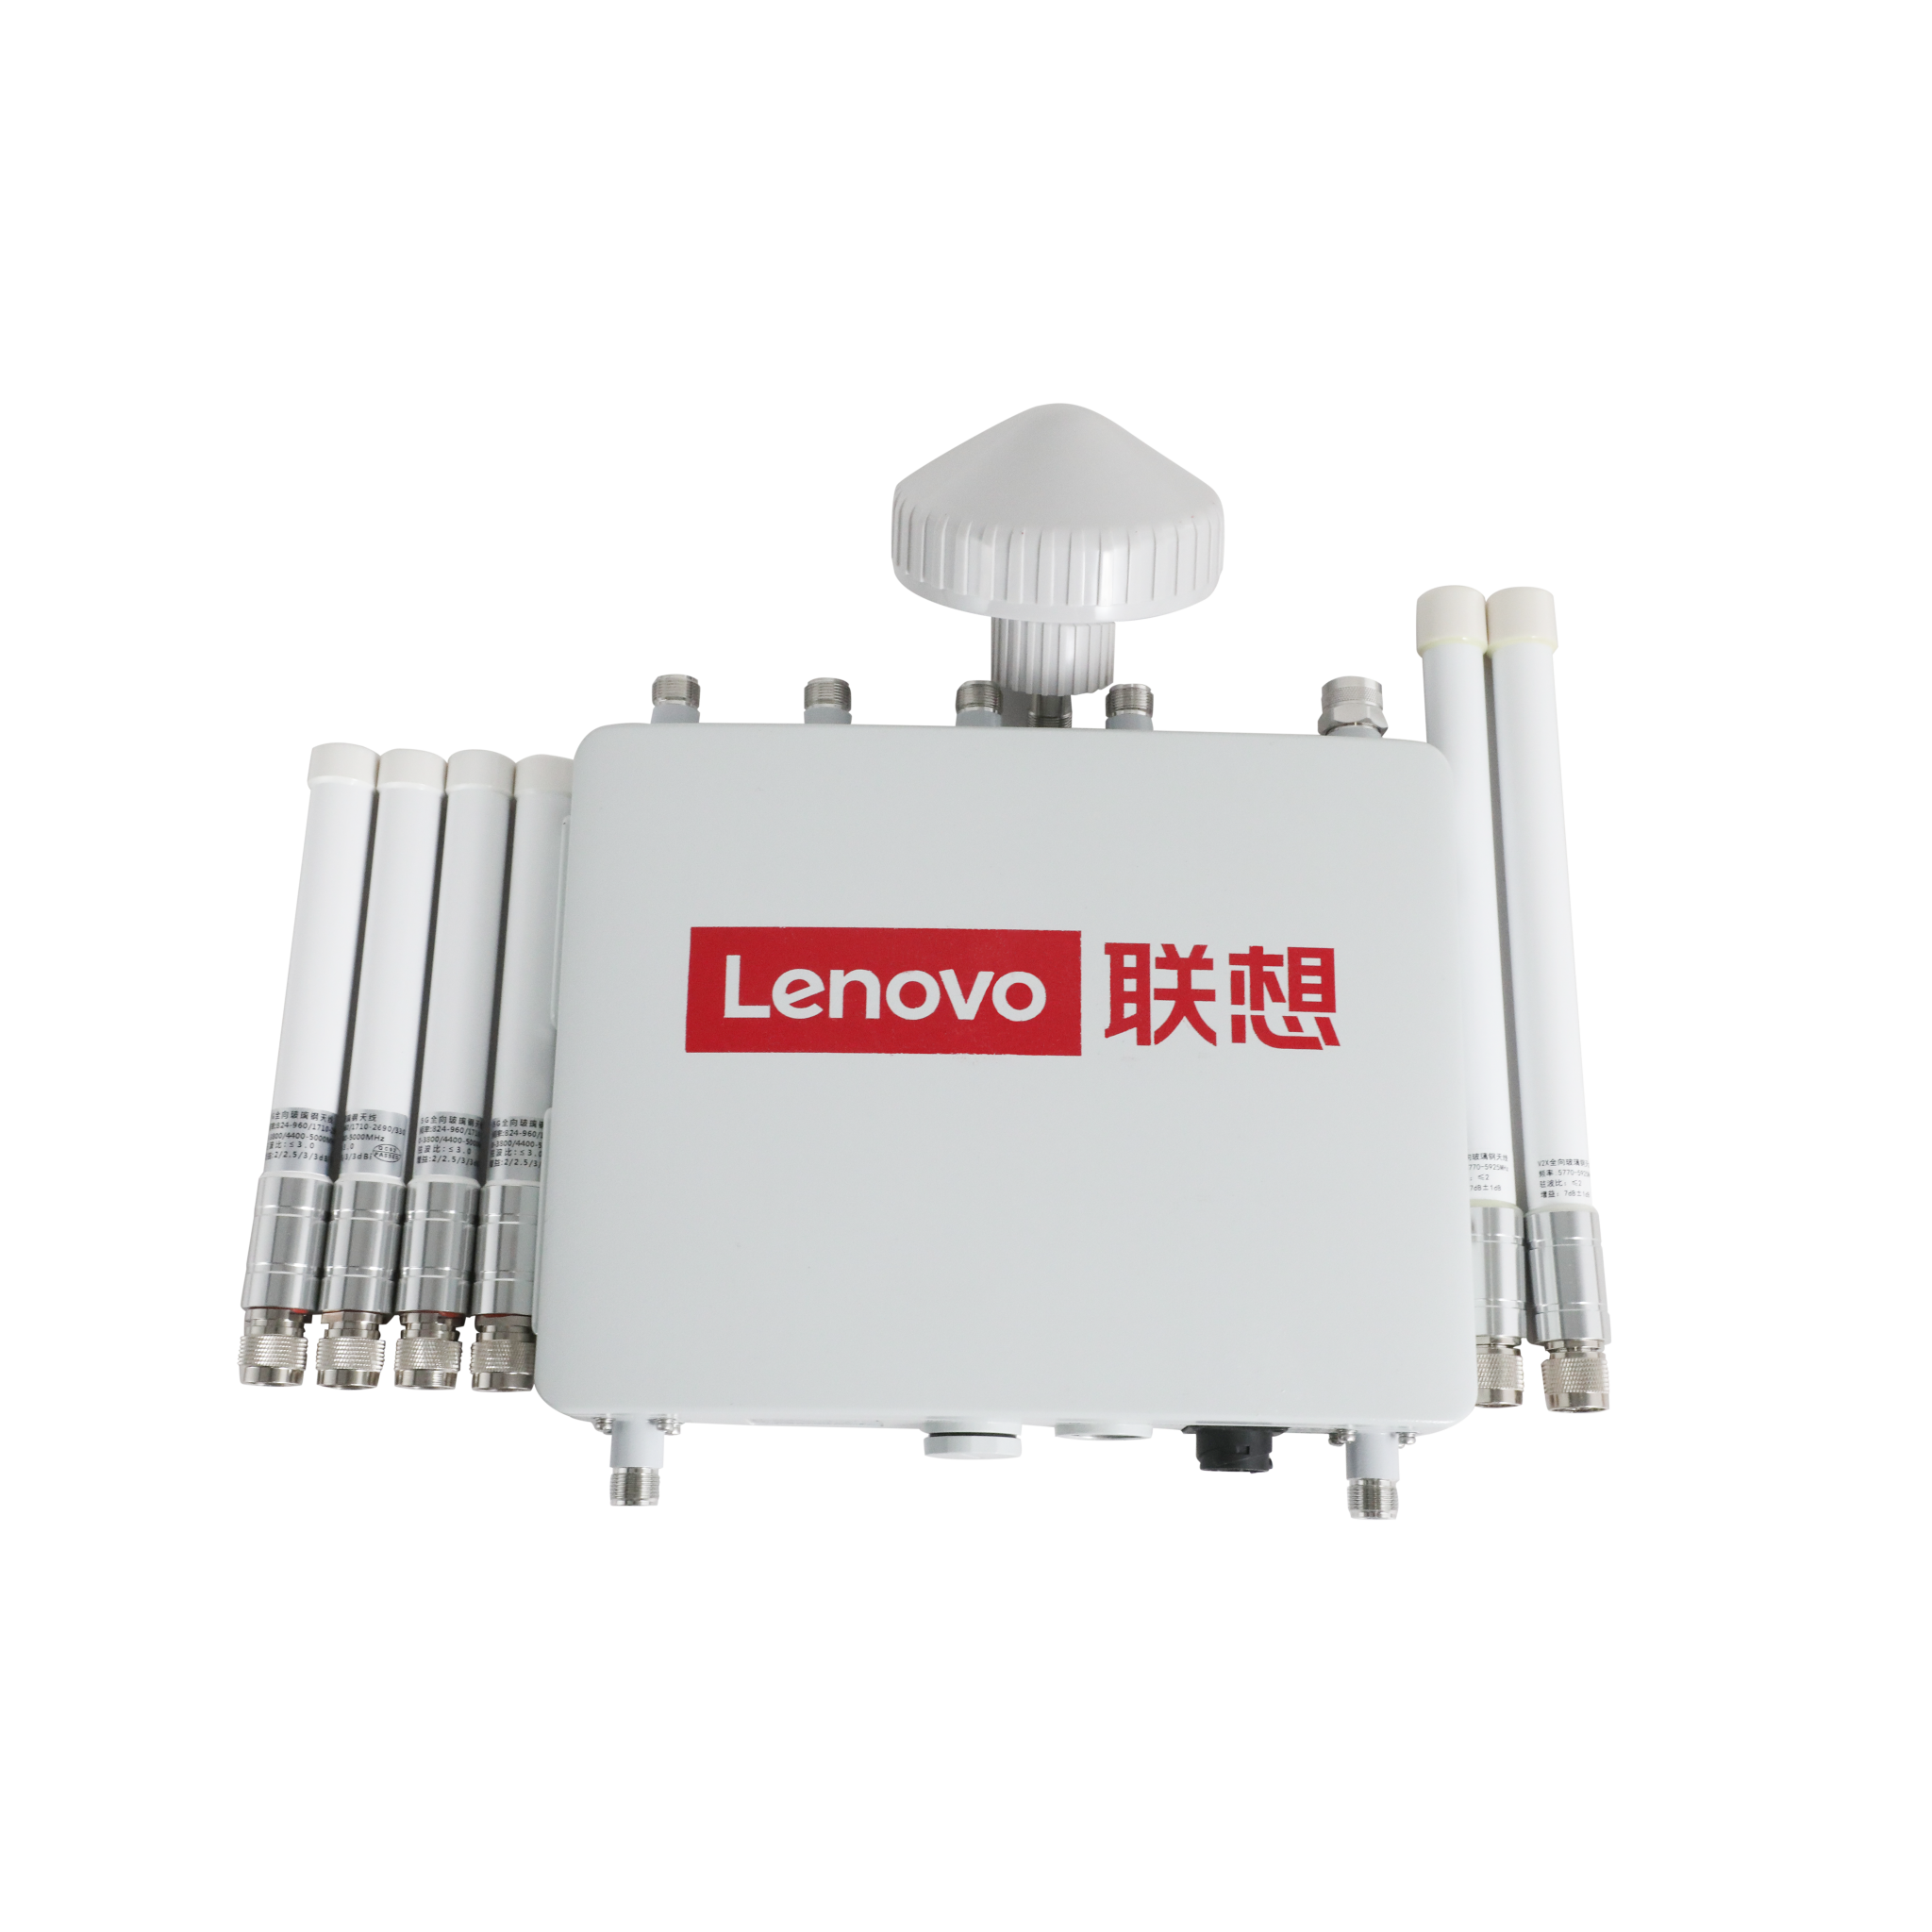 Lenovo 5G + MEC + V2X Solution